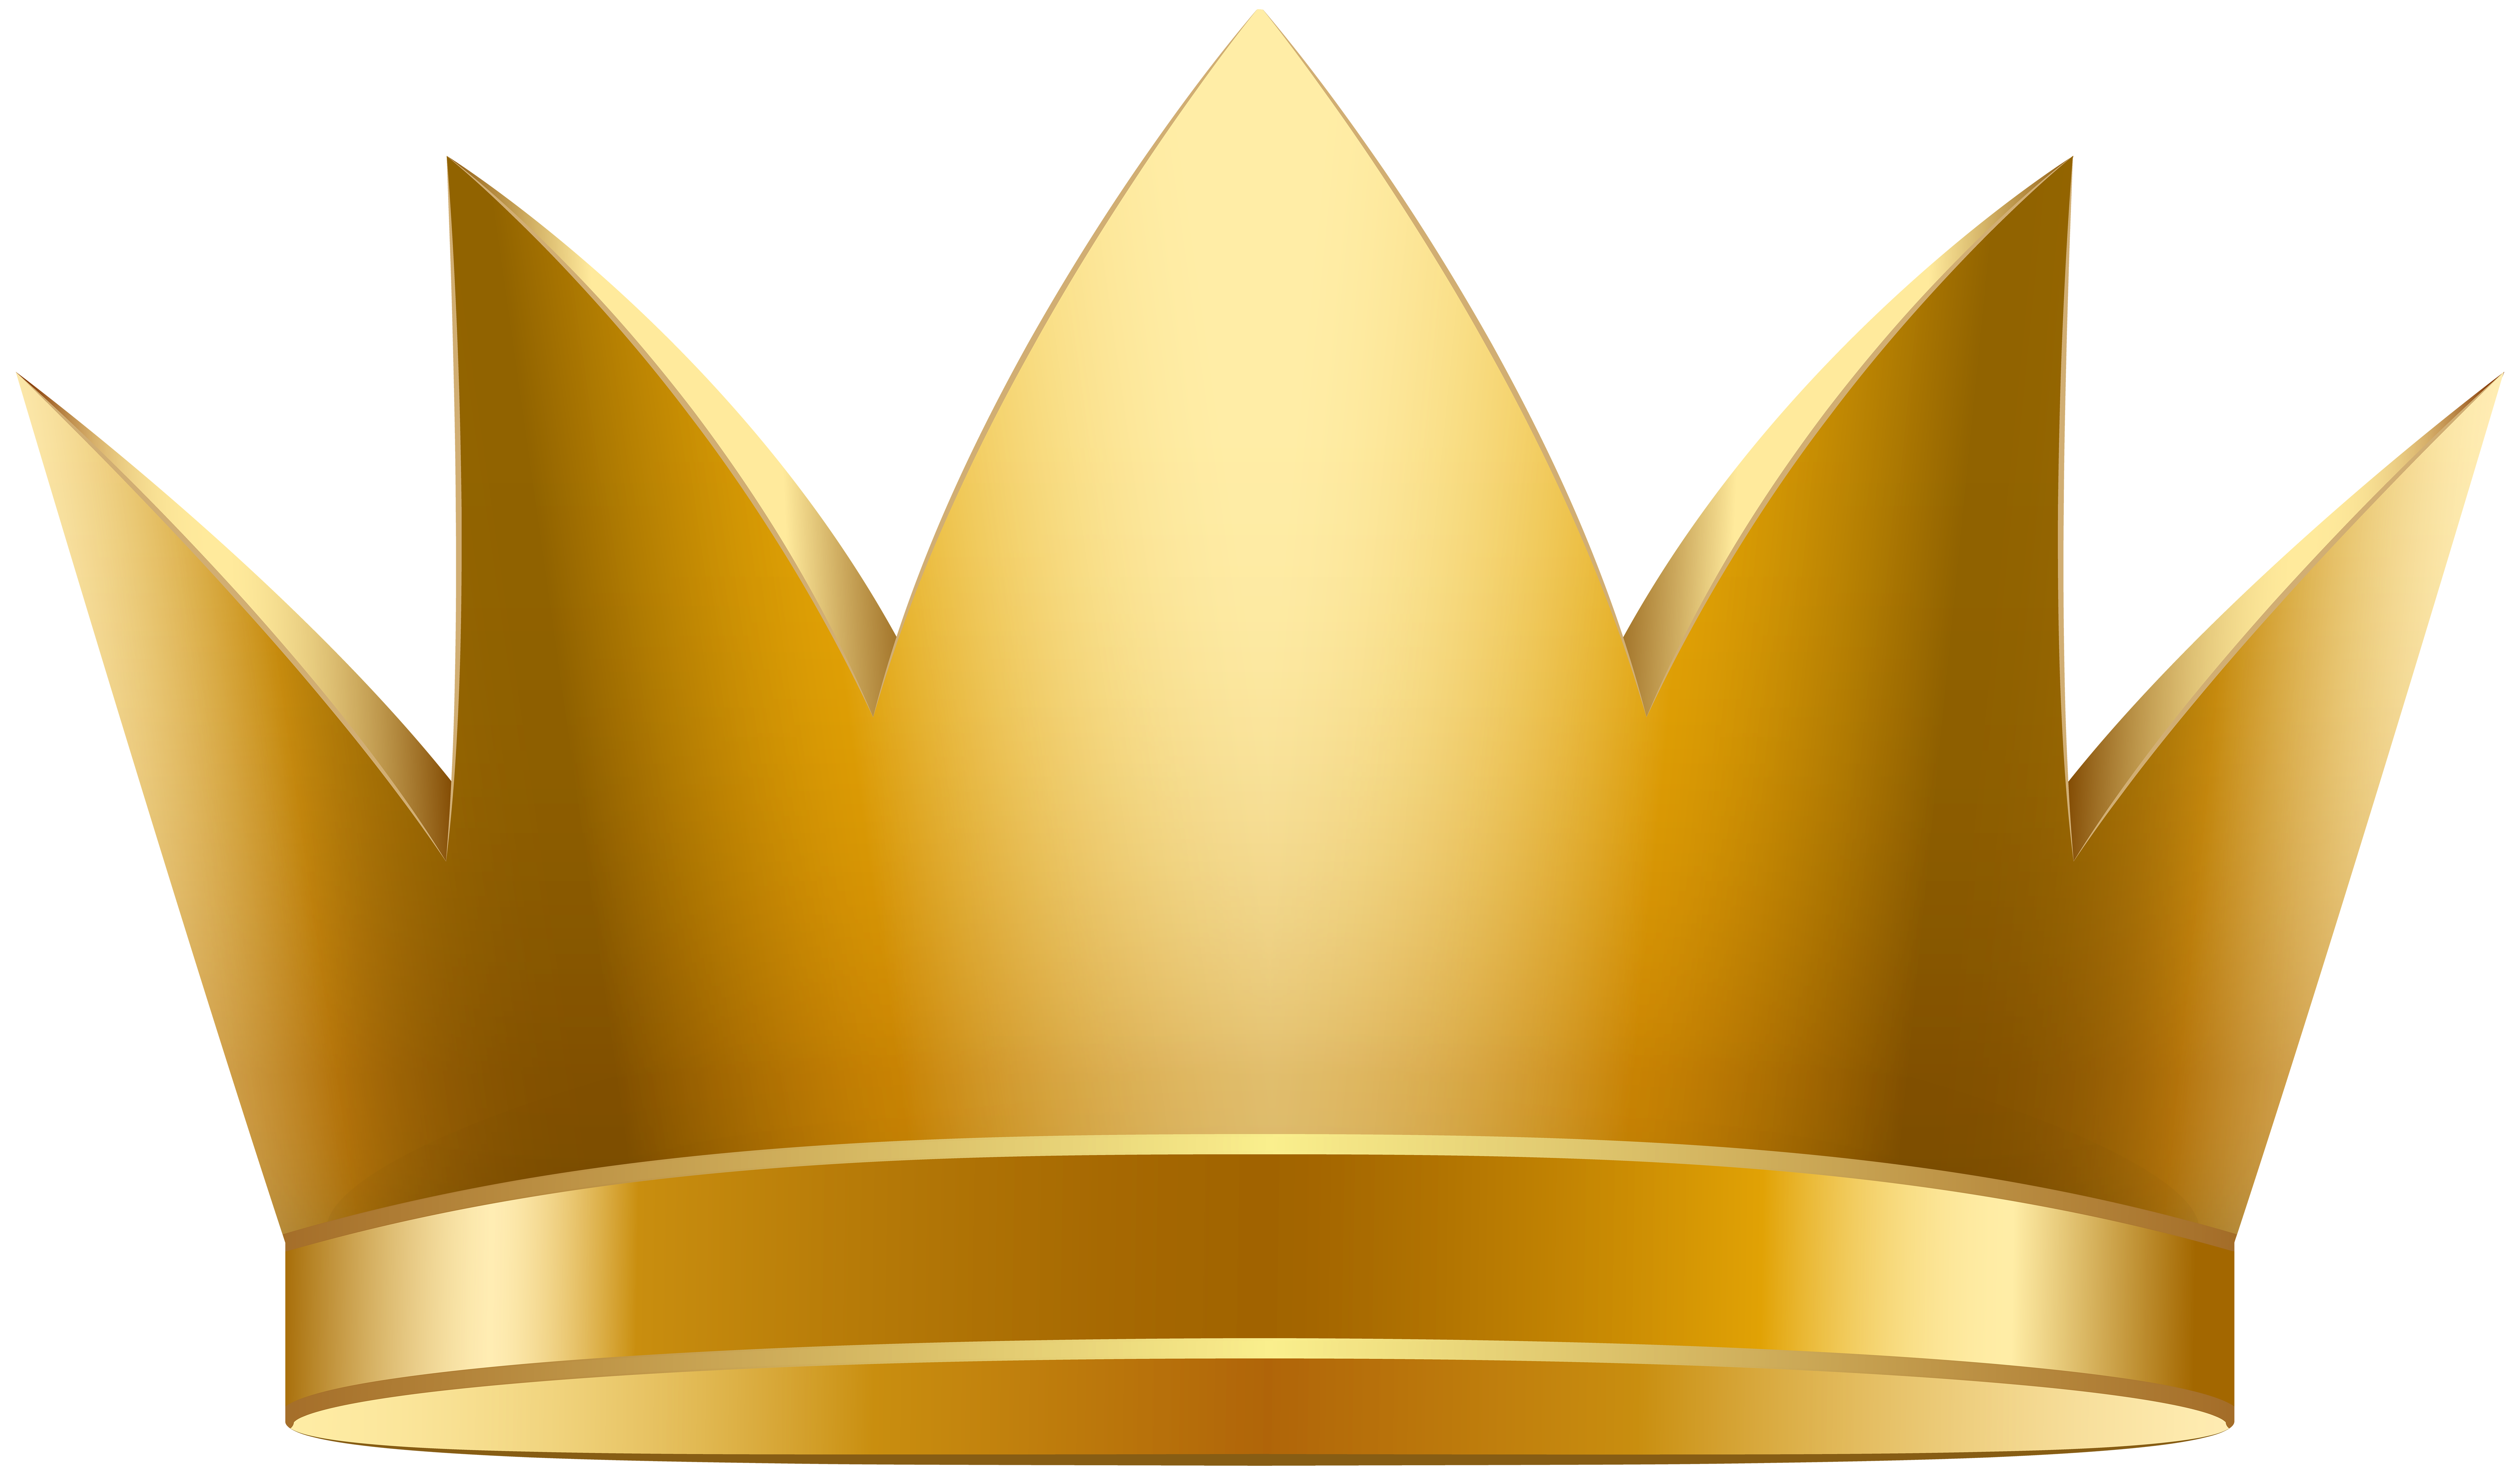 Golden Crown PNG Clip Art Image.